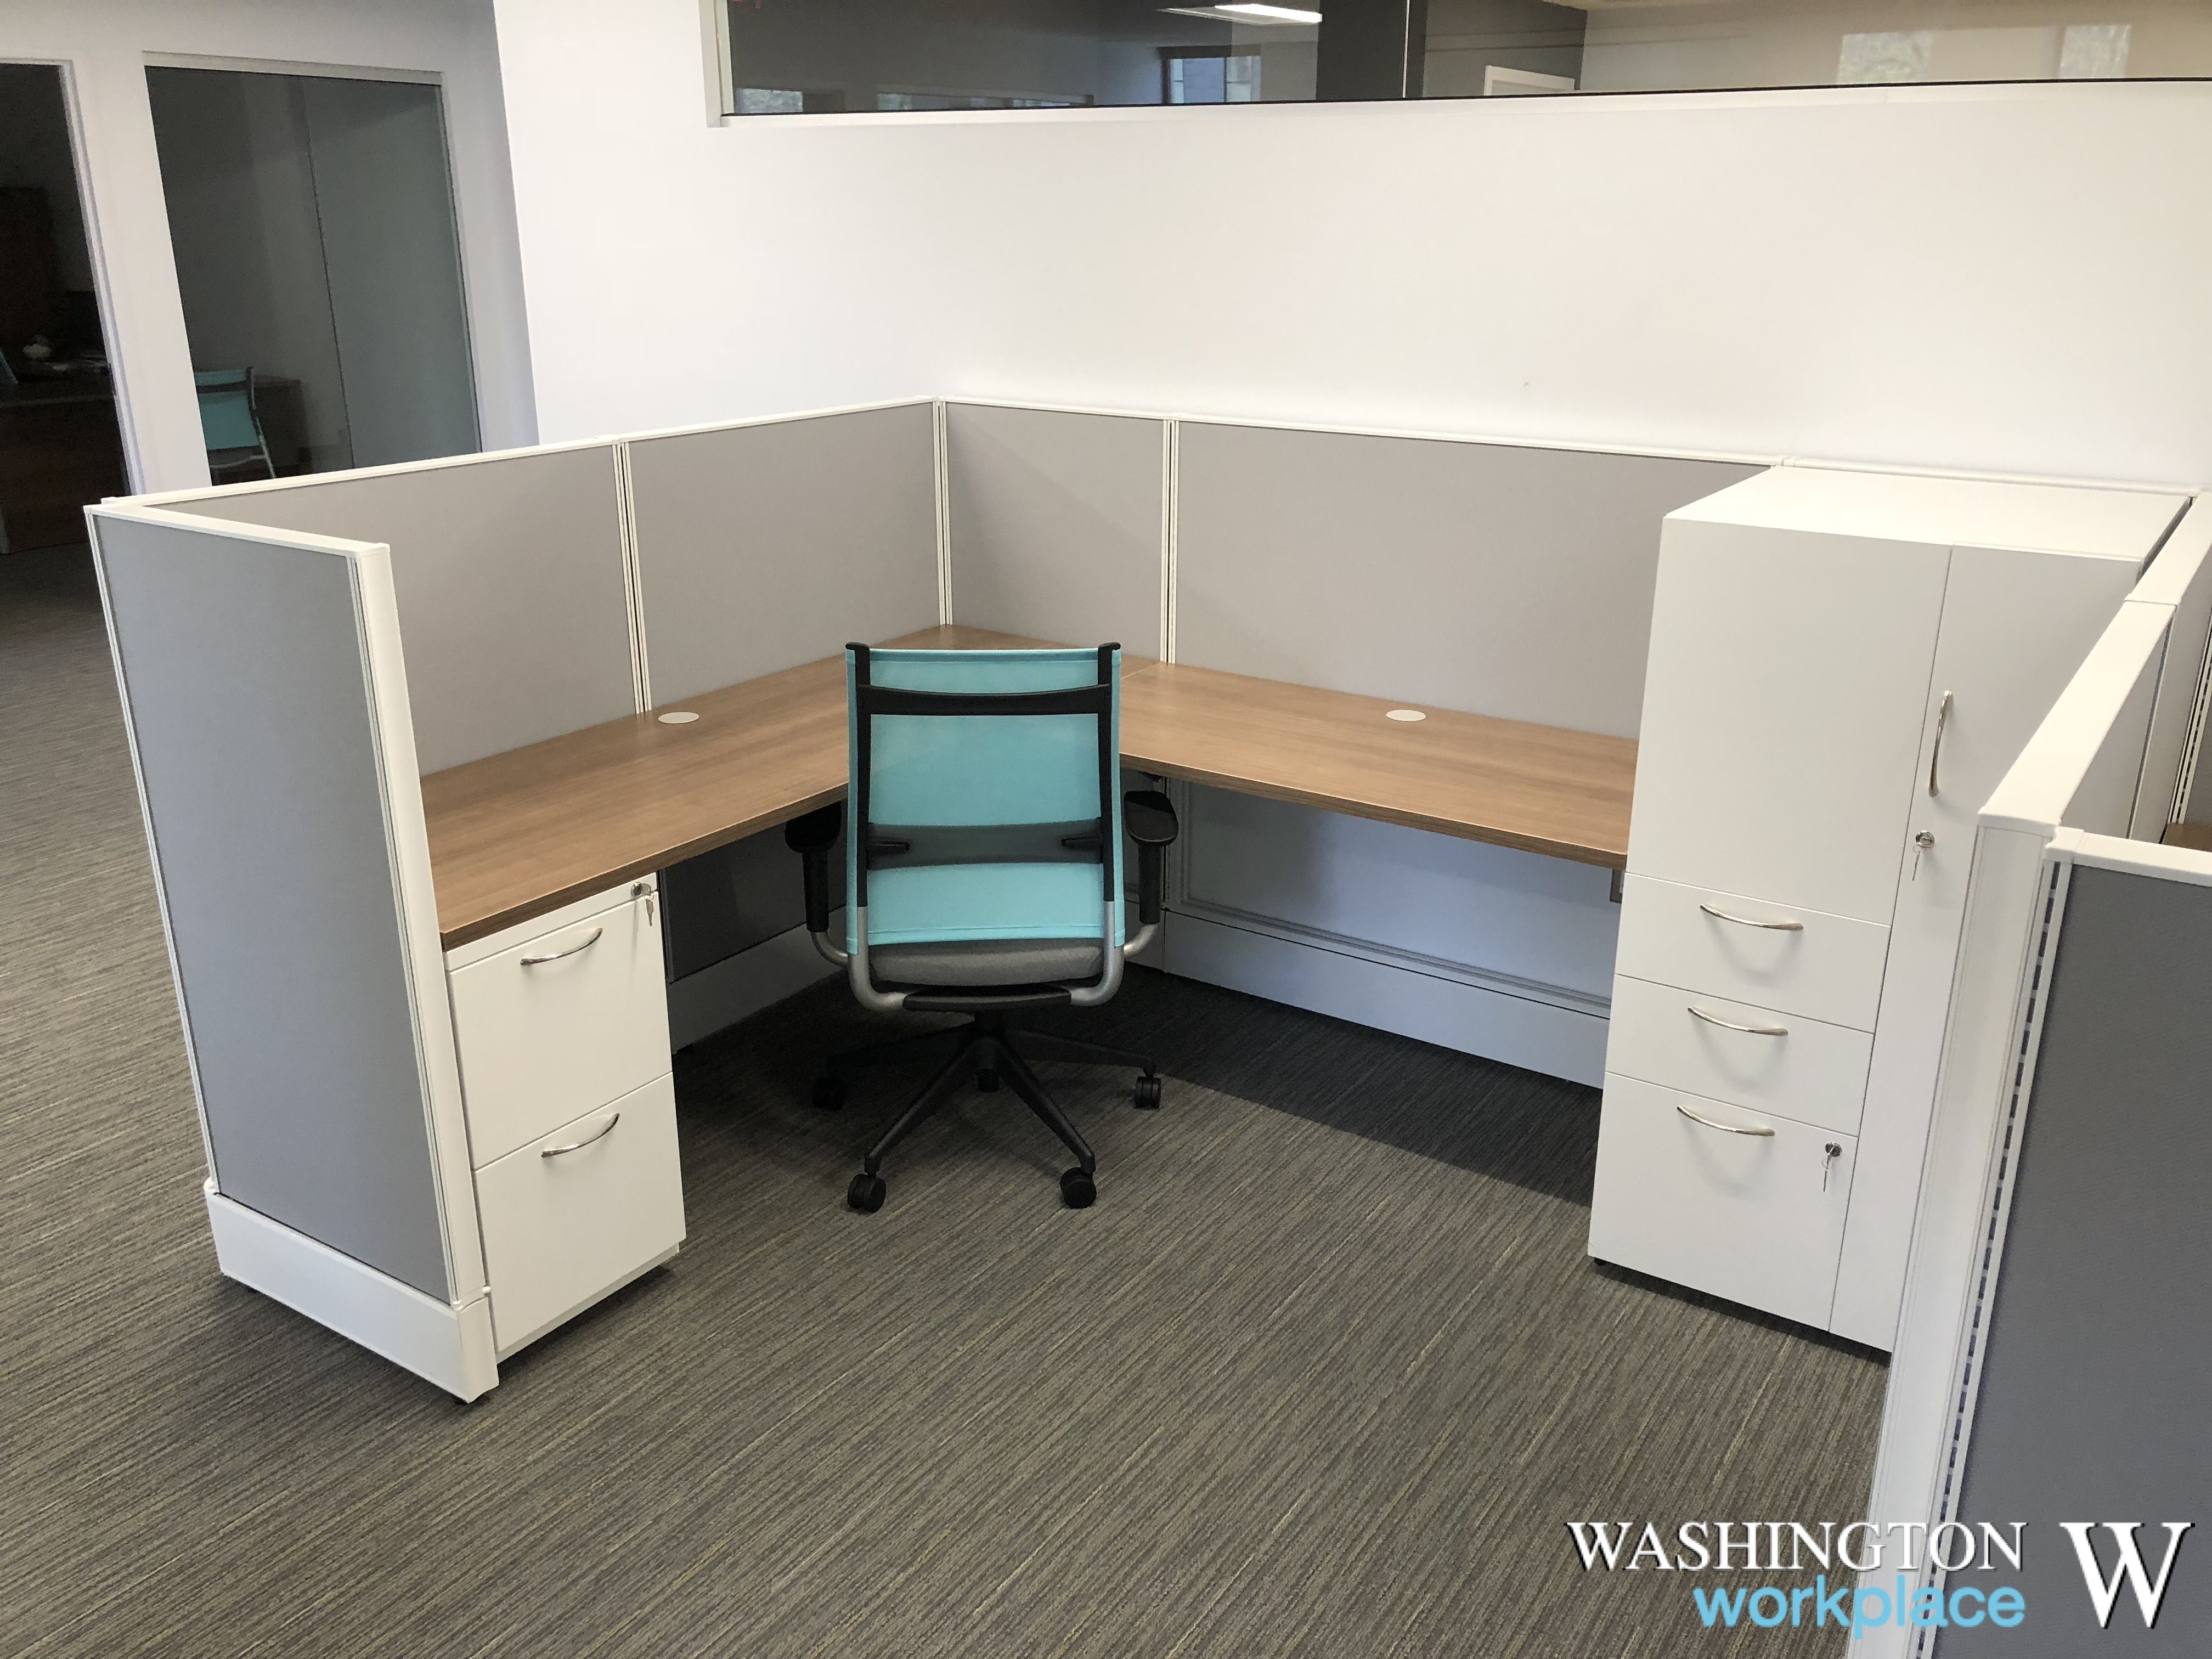 Washington Workplace Installation